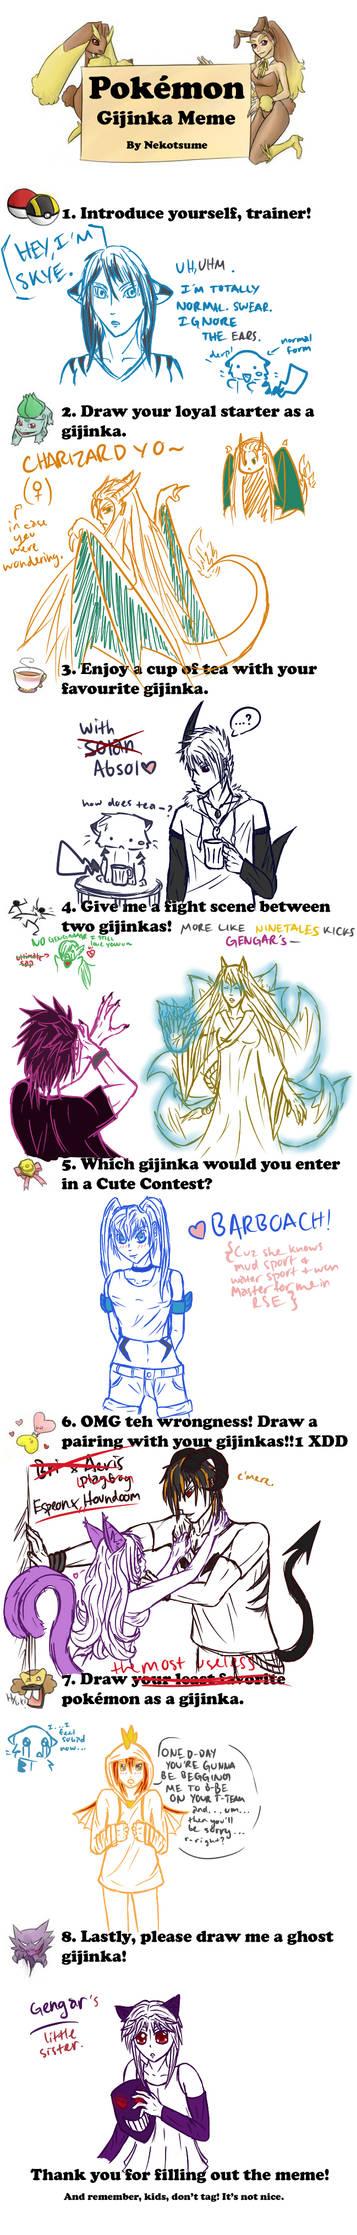 Pokemon Gijinka Meme by Nekotsume